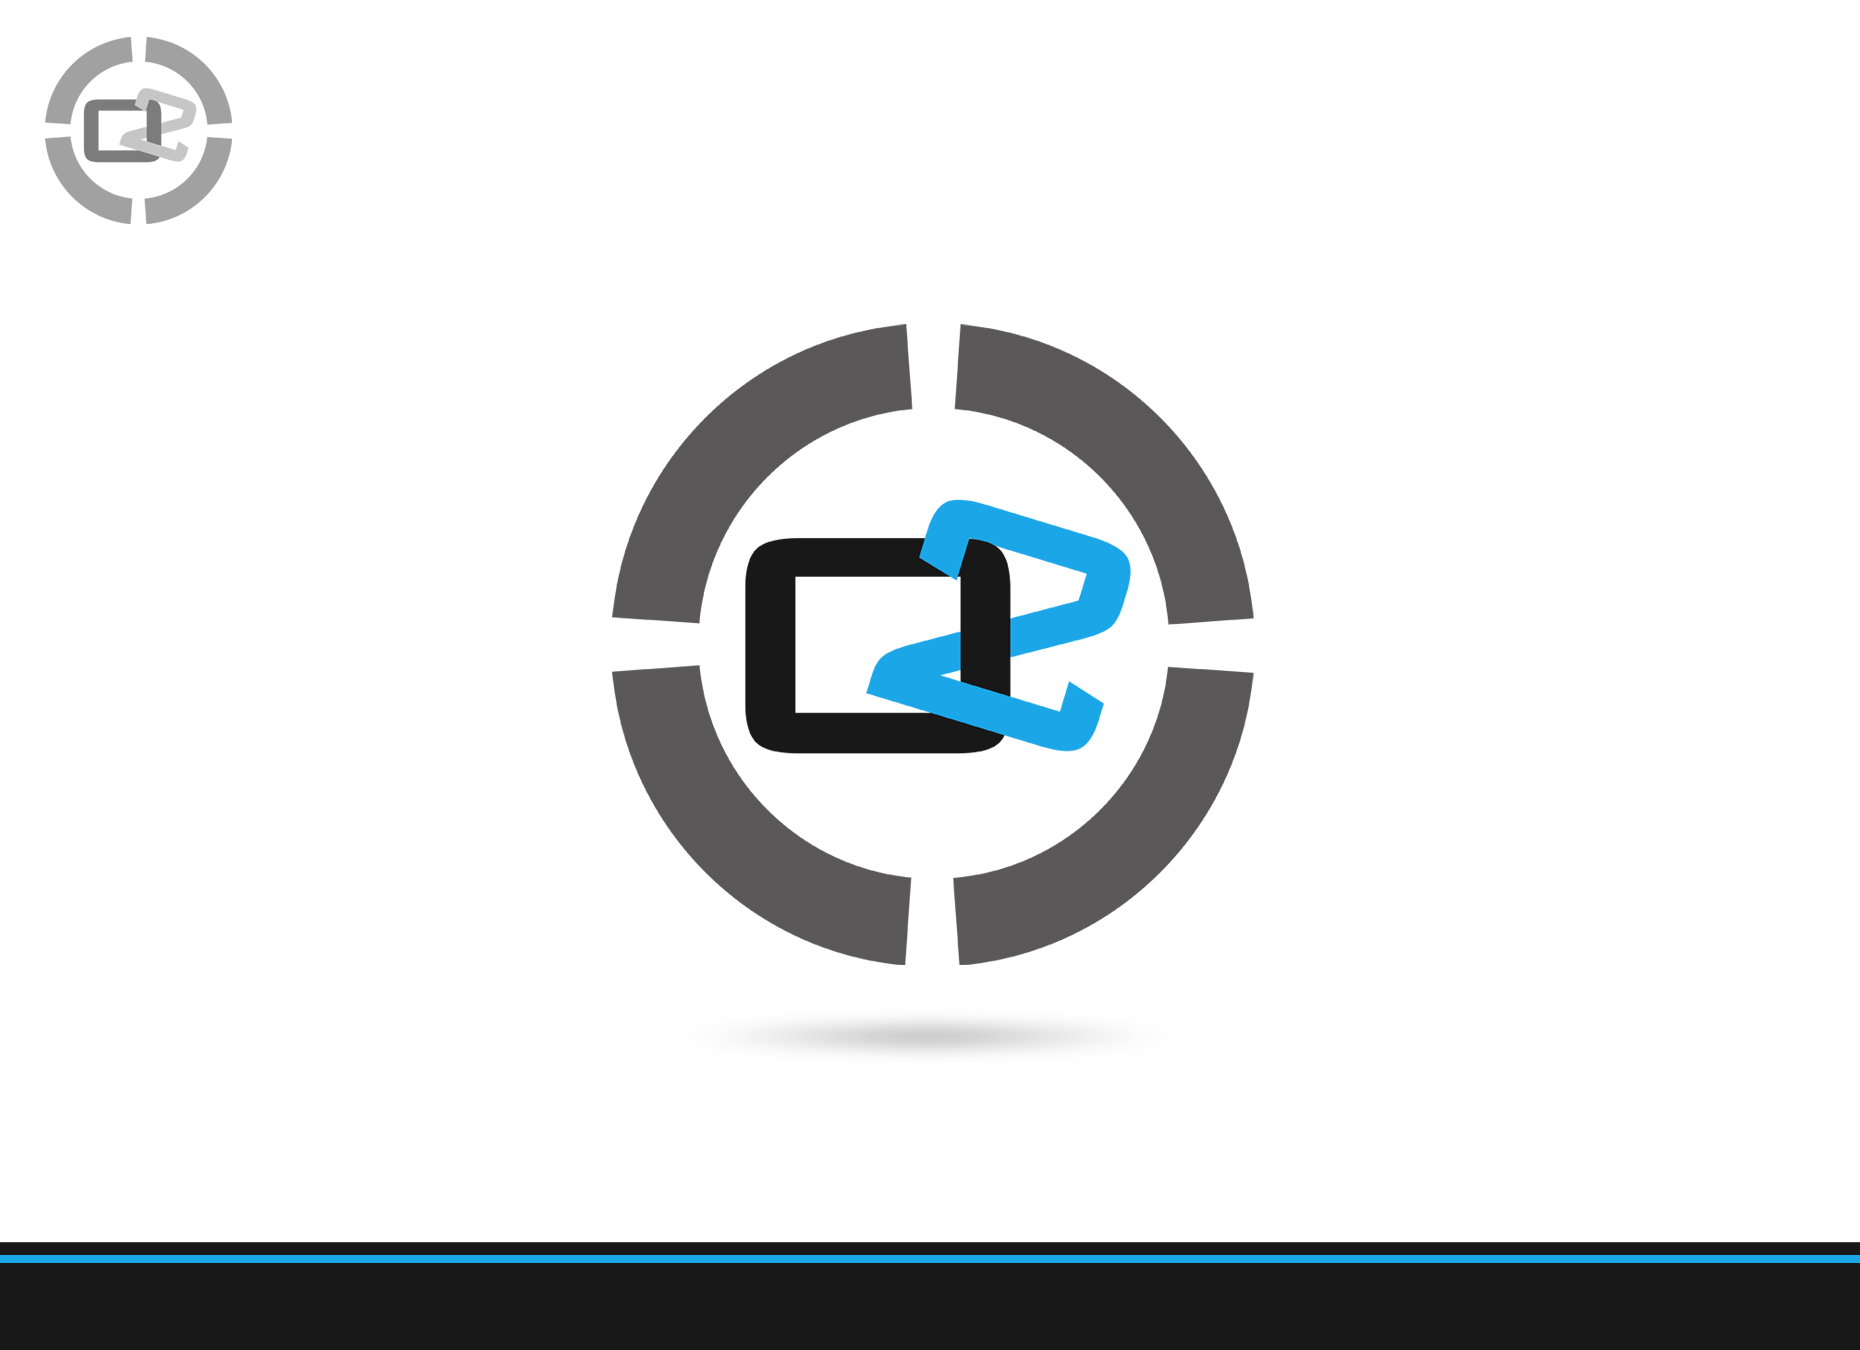 Logo Design by omARTist - Entry No. 1 in the Logo Design Contest Artistic Logo Design for O2.